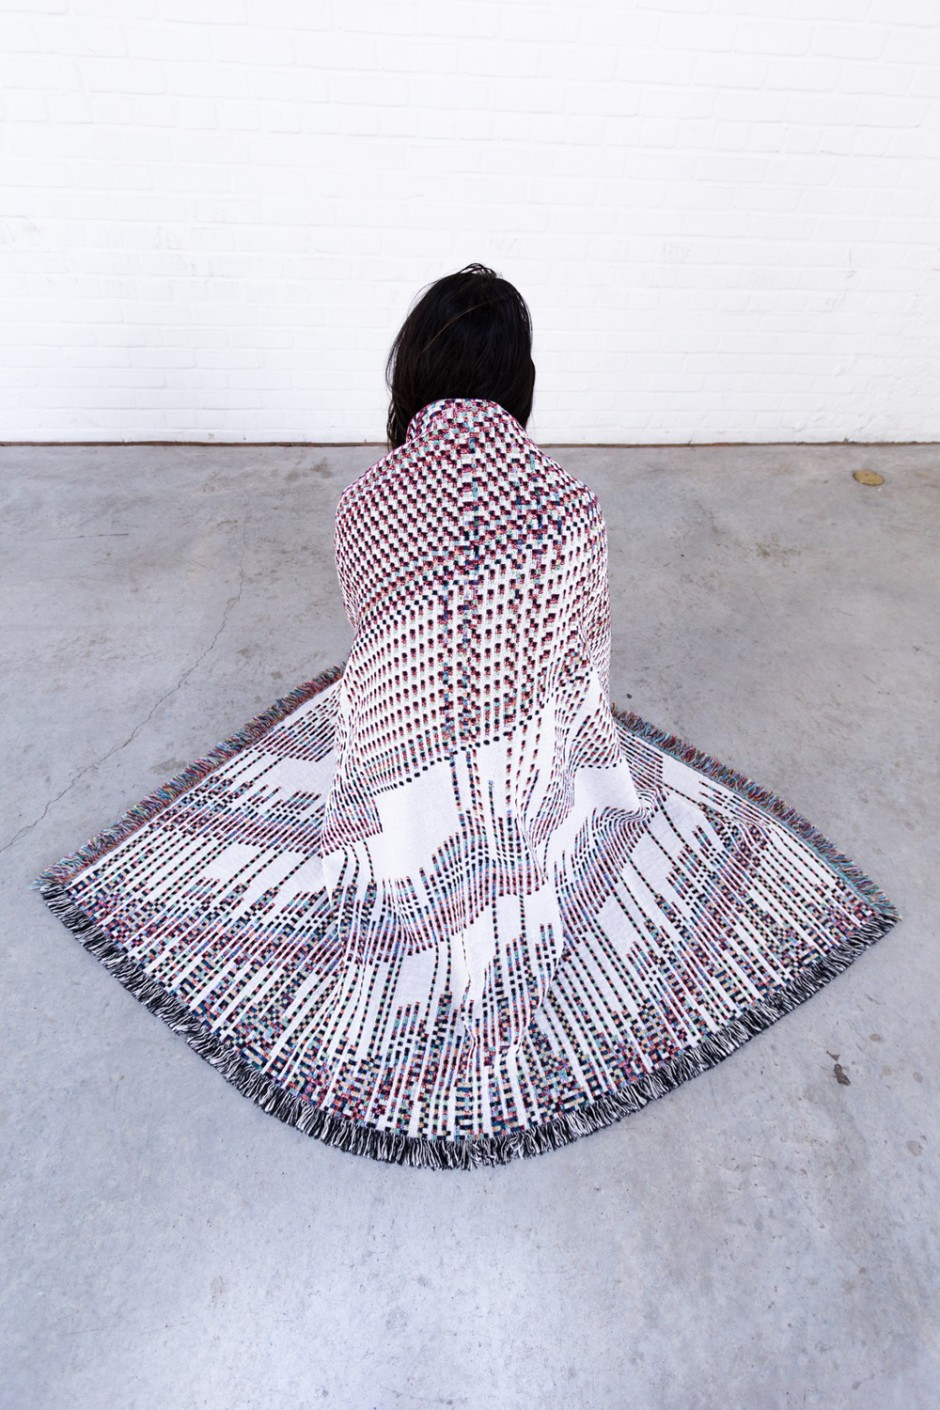 glitch-textiles91